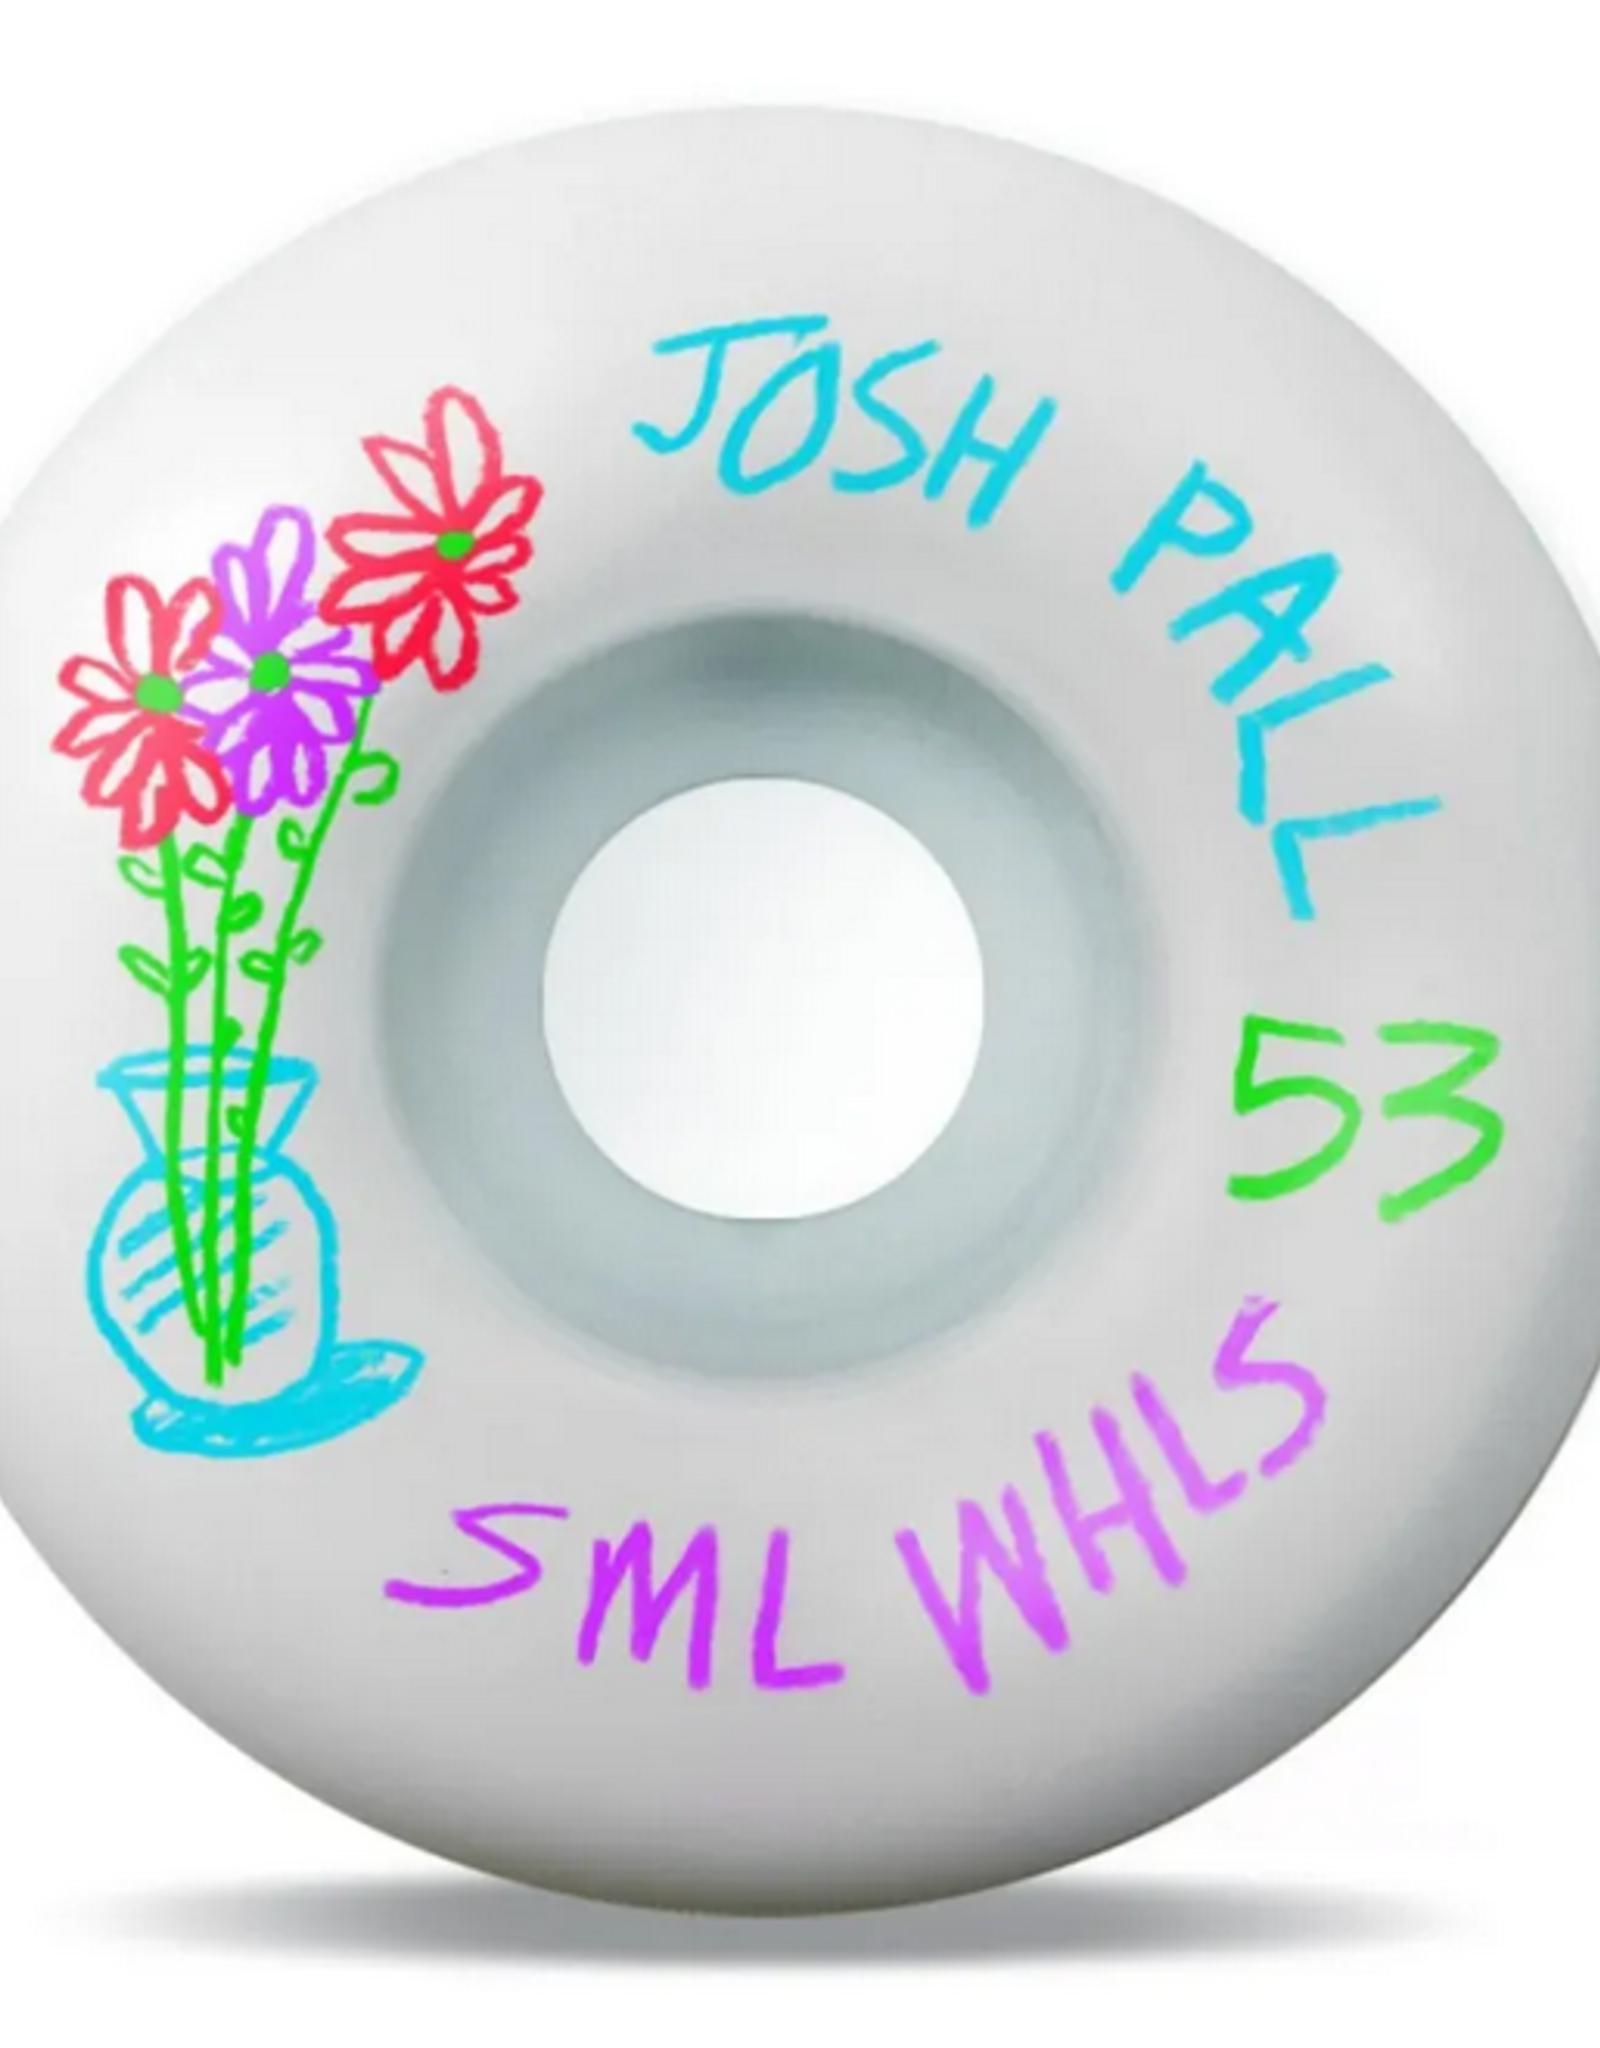 SML SML 53MM OG WIDE 99A JOSH PALL PENCIL PUSHER WHEELS